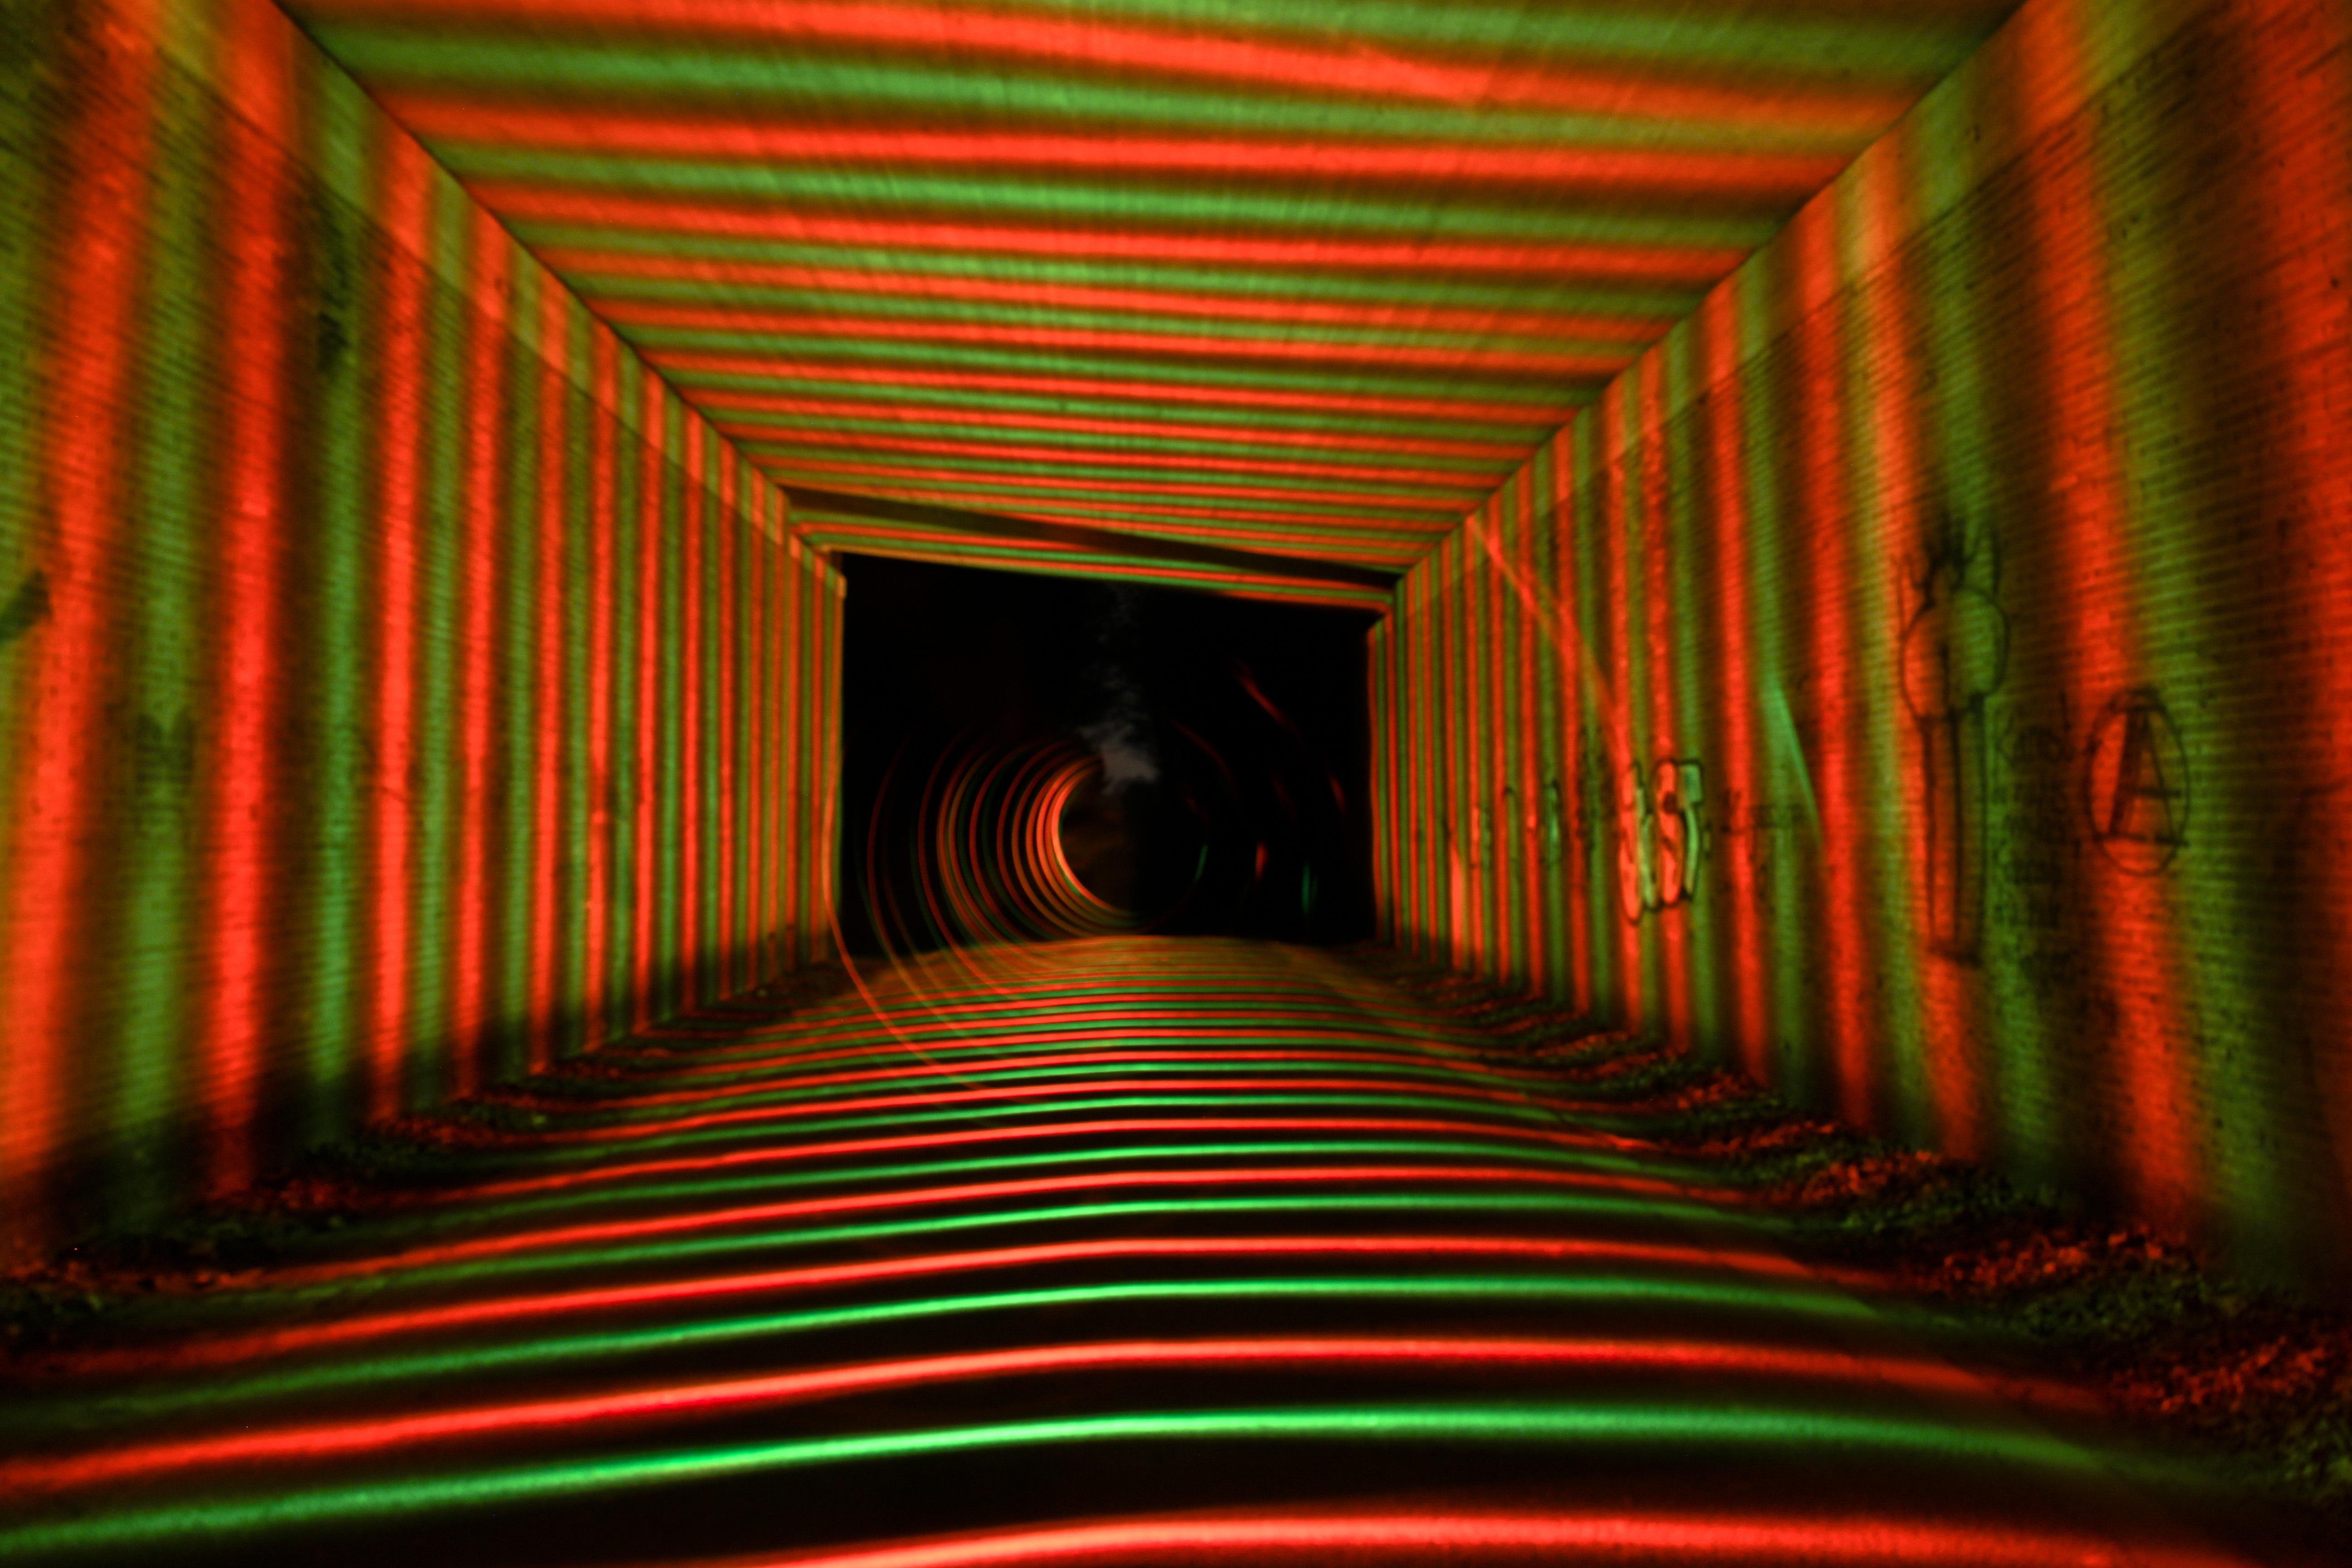 Groen Led Licht : Gratis afbeeldingen structuur nacht zonlicht groen rood